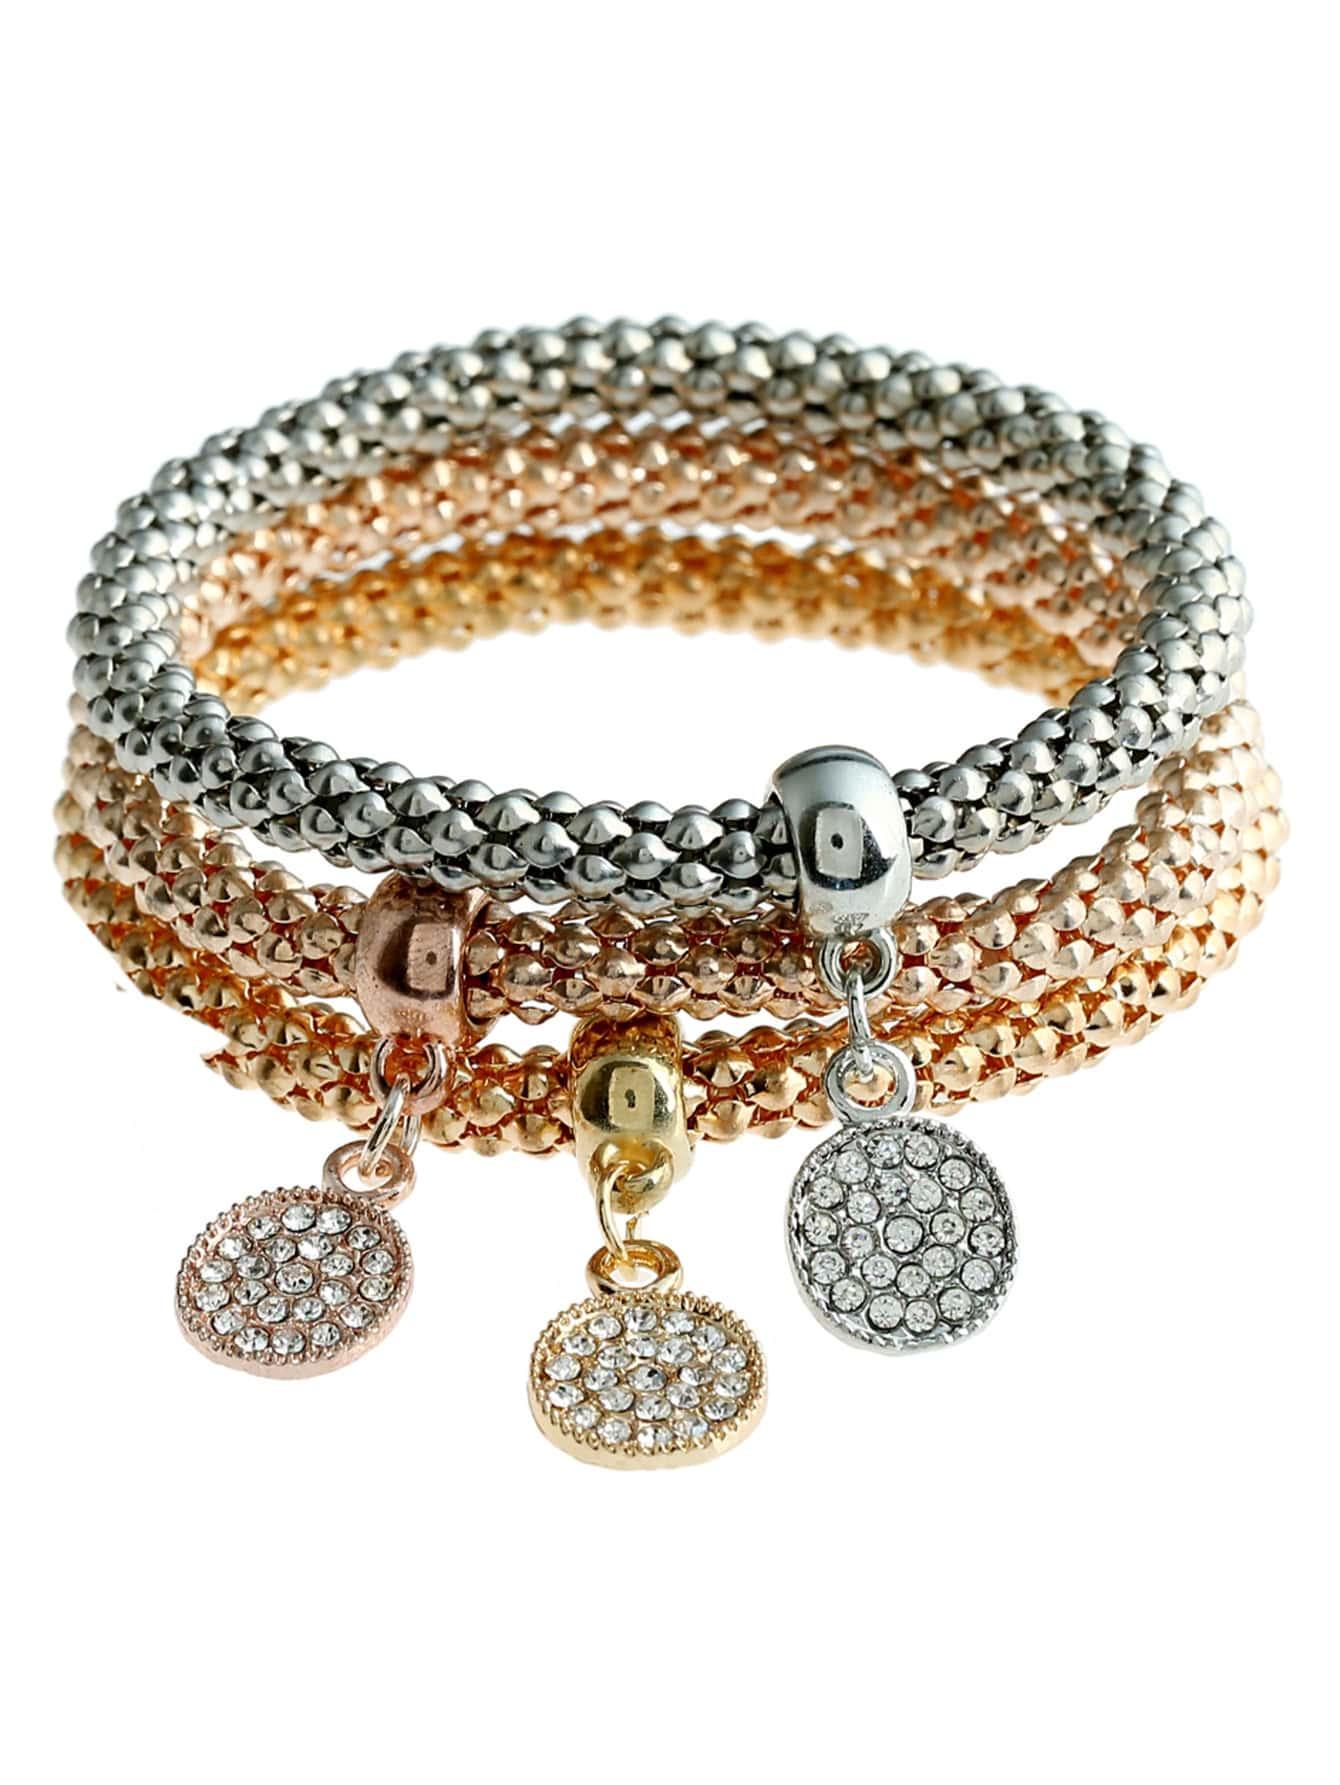 Rhinestone Charm Bracelet 3pcs